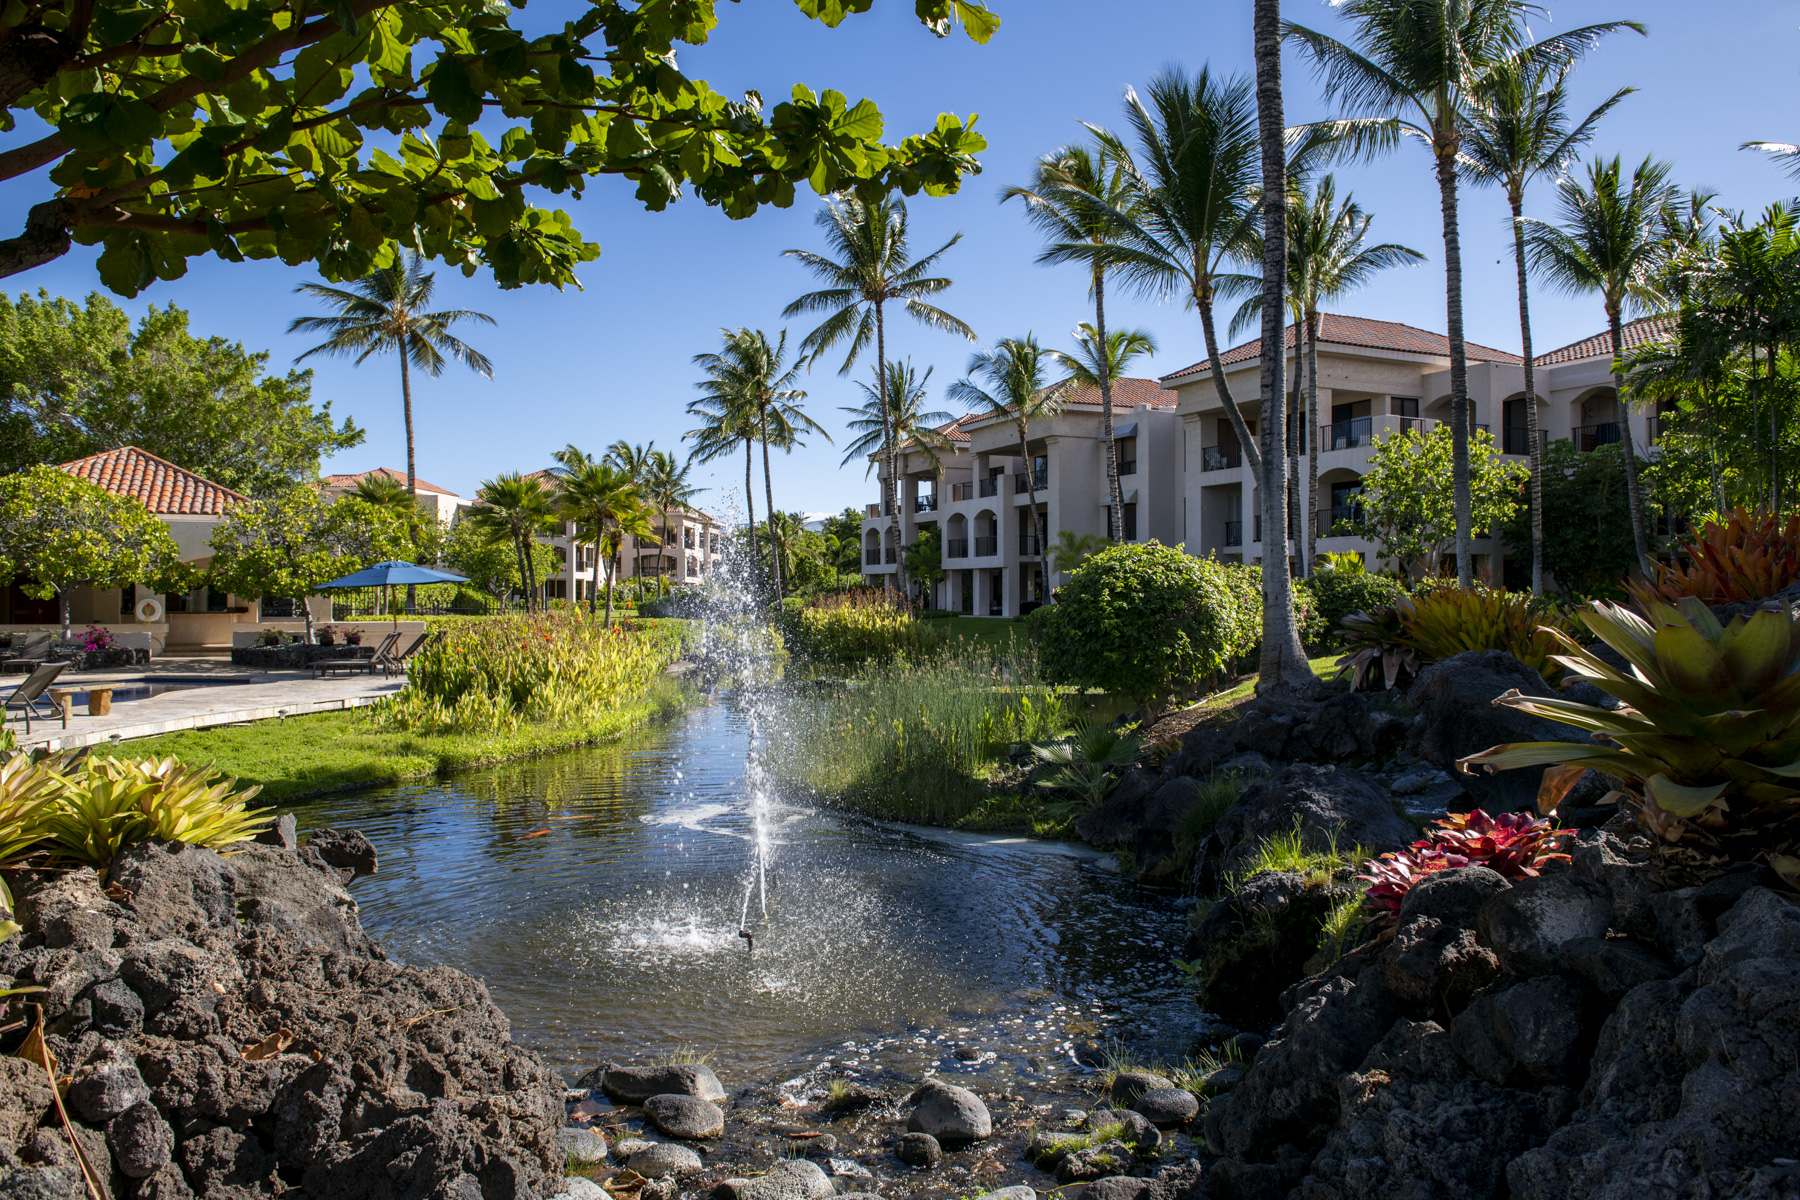 Condominiums 為 出售 在 69-1035 Keana Place, Waikoloa Village, HI 96738 Waikoloa, 夏威夷 96738 美國